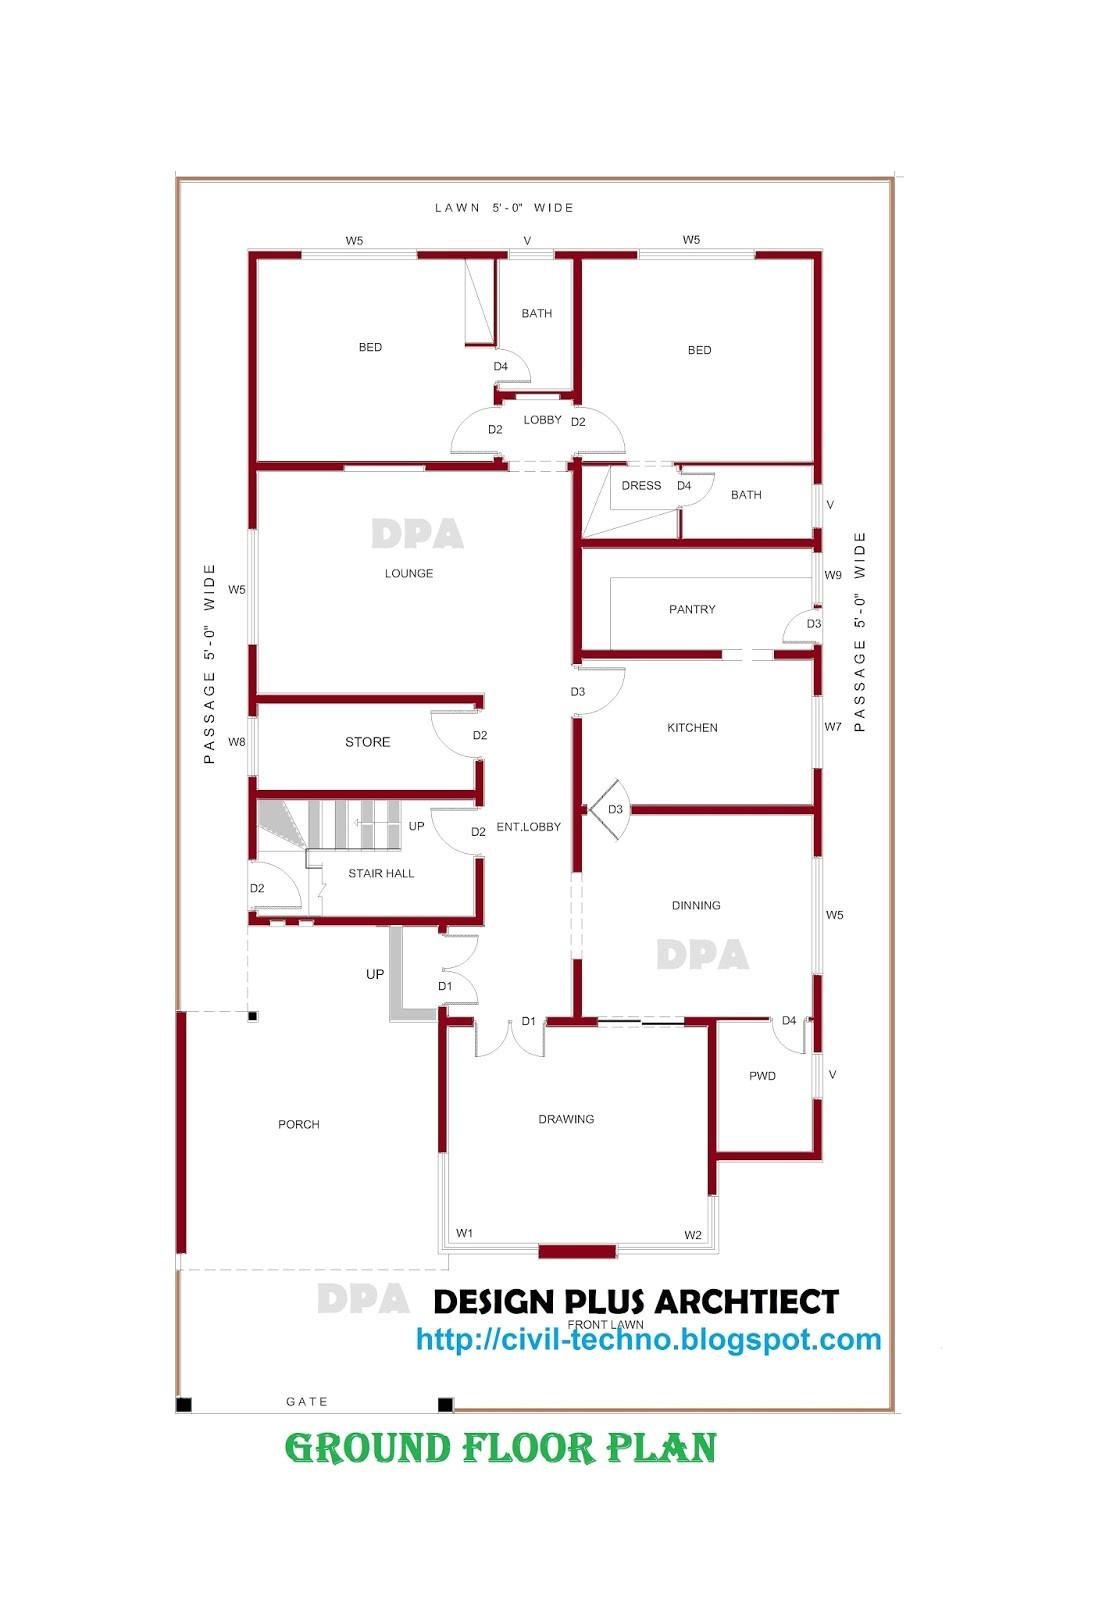 Home Design Plans Home Plans In Pakistan Home Decor Architect Designer